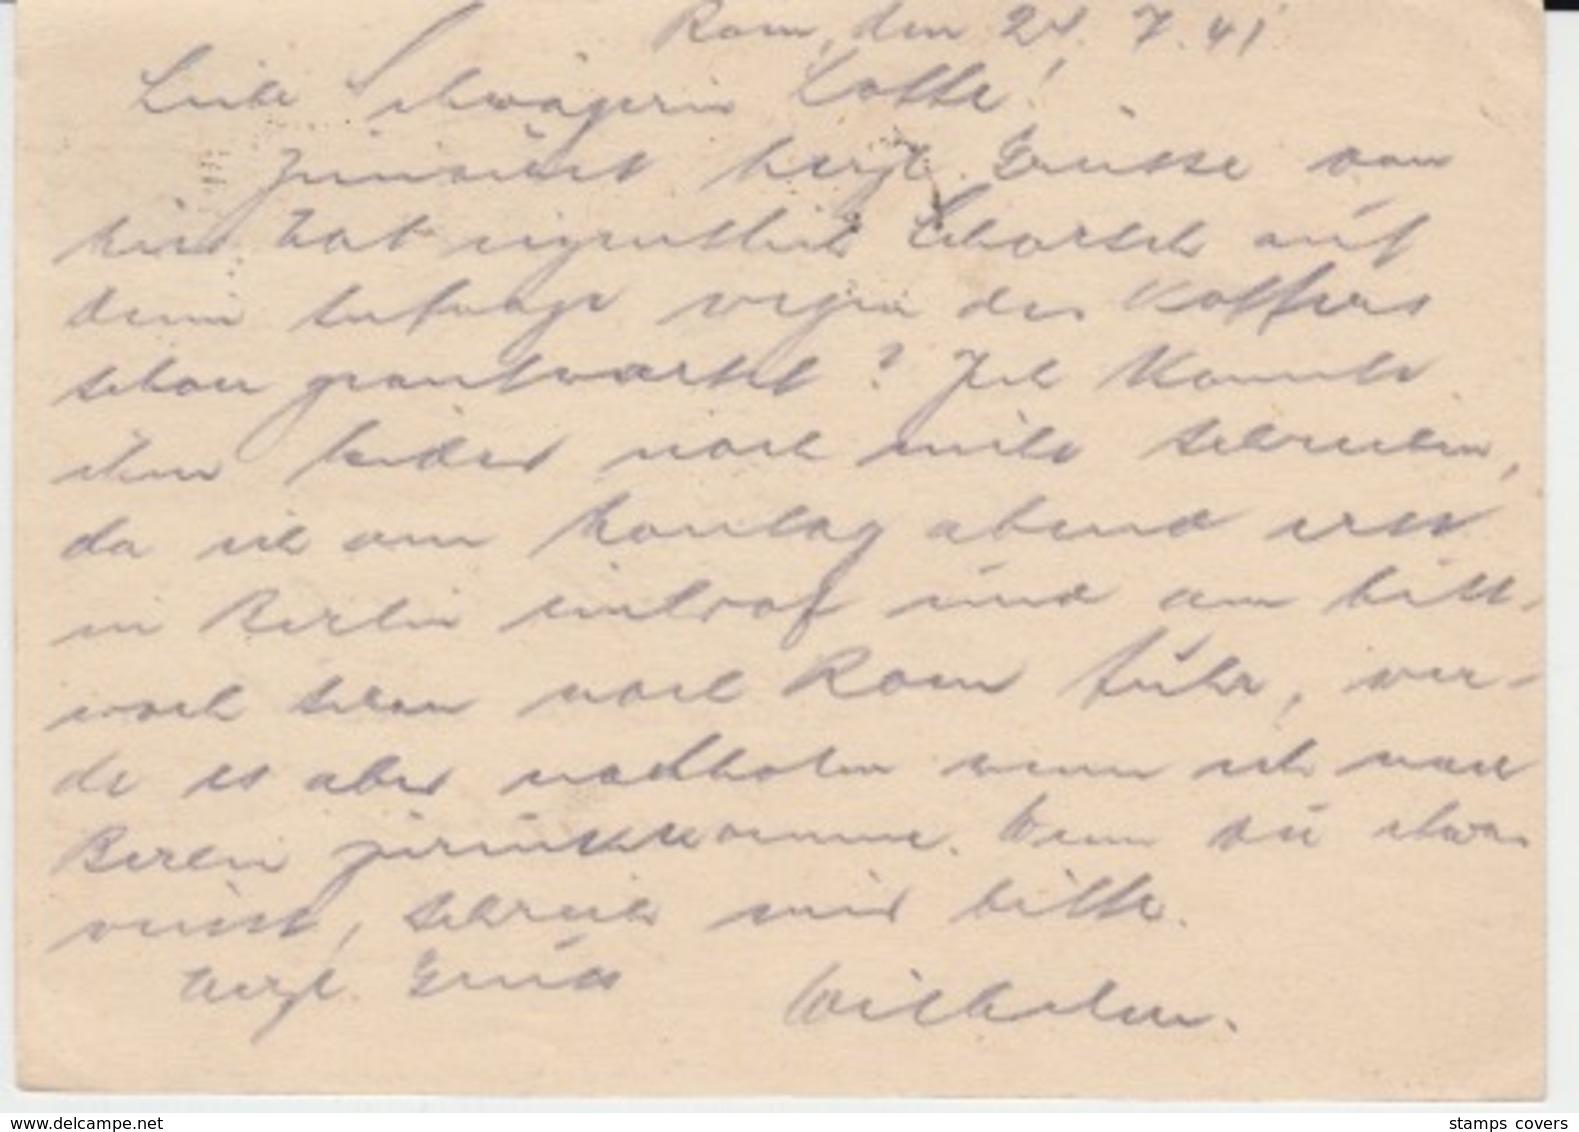 USED CARTE POSTALE 27/07/1941 ROMA FERROVIA - Paketmarken